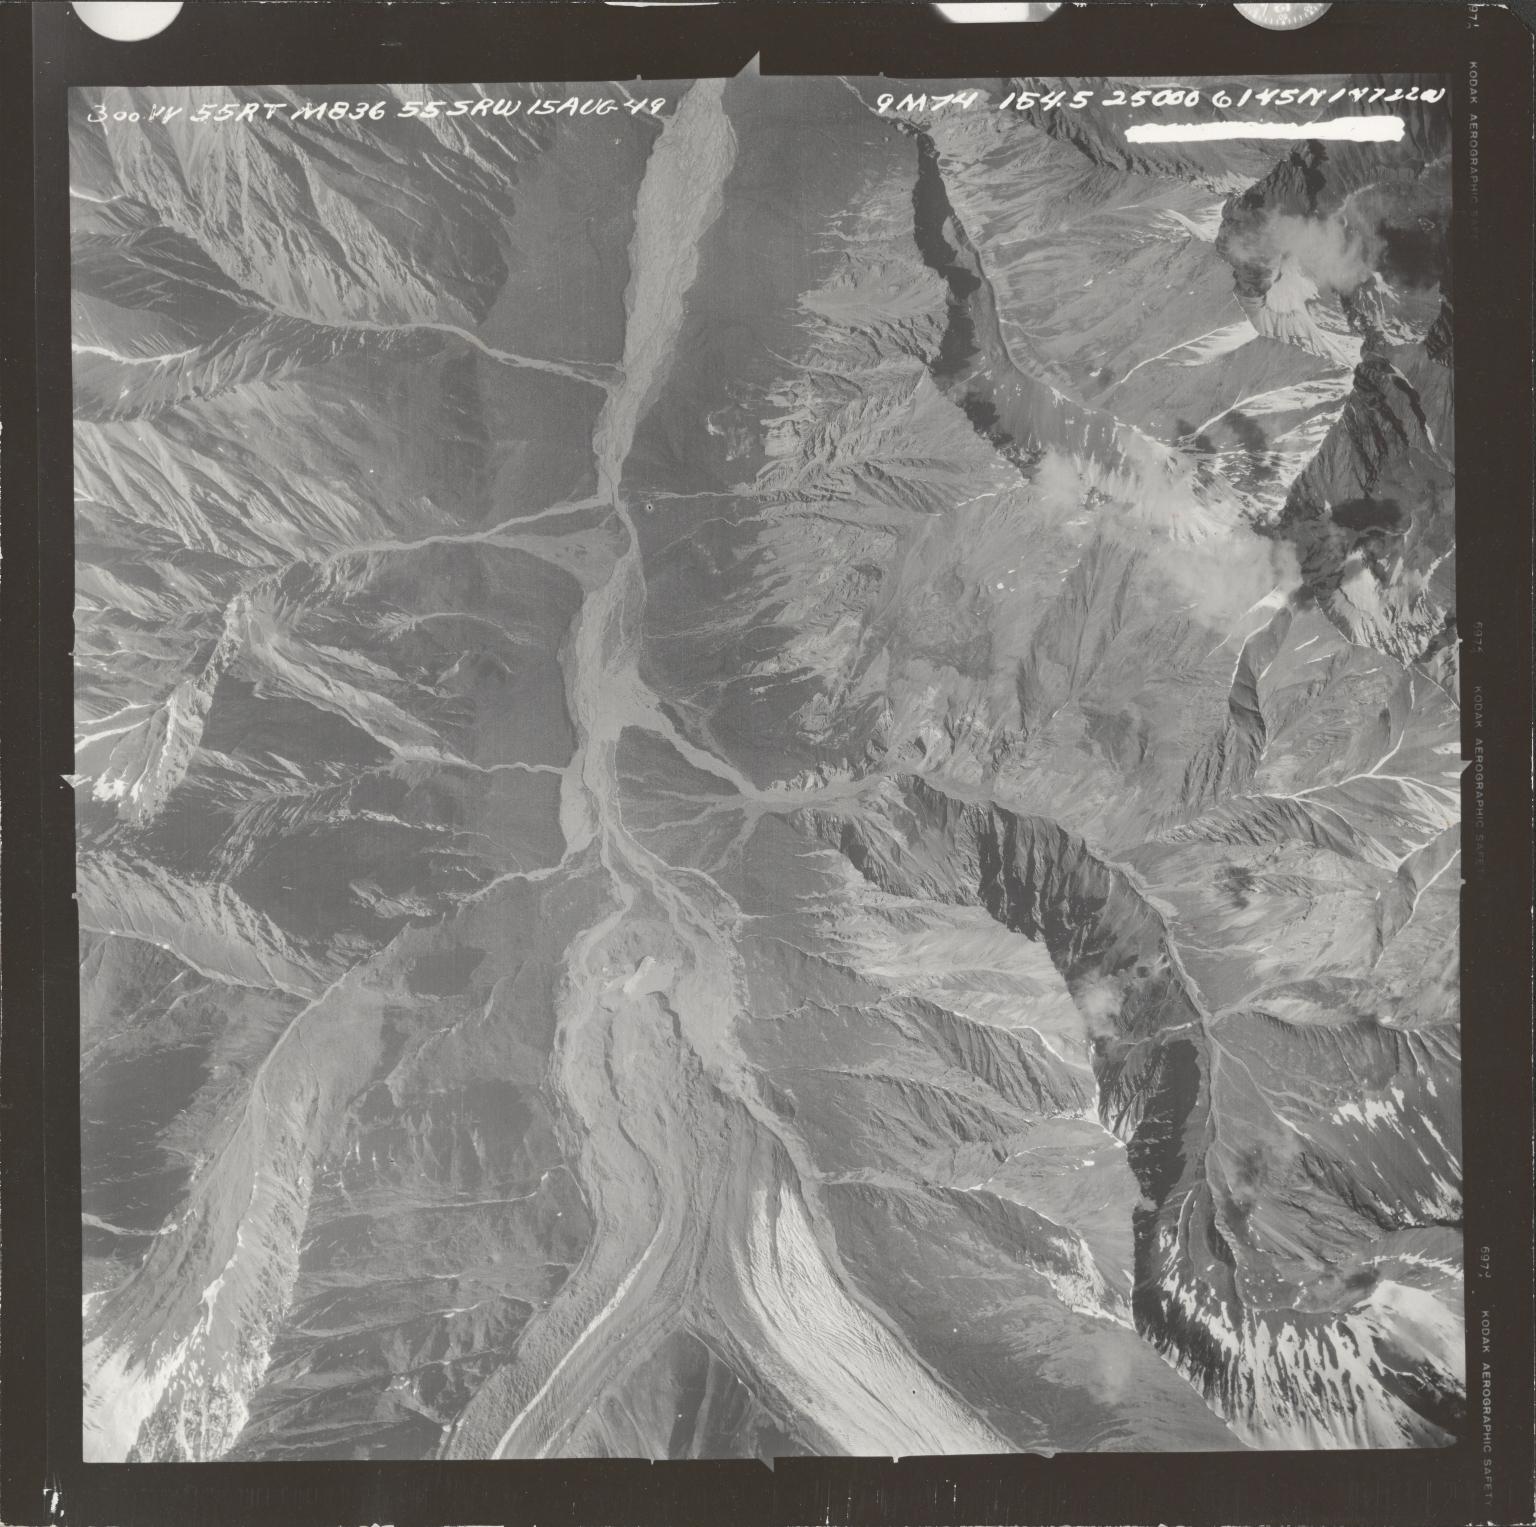 Talkeetna Mountains, aerial photograph M 836 300, Alaska